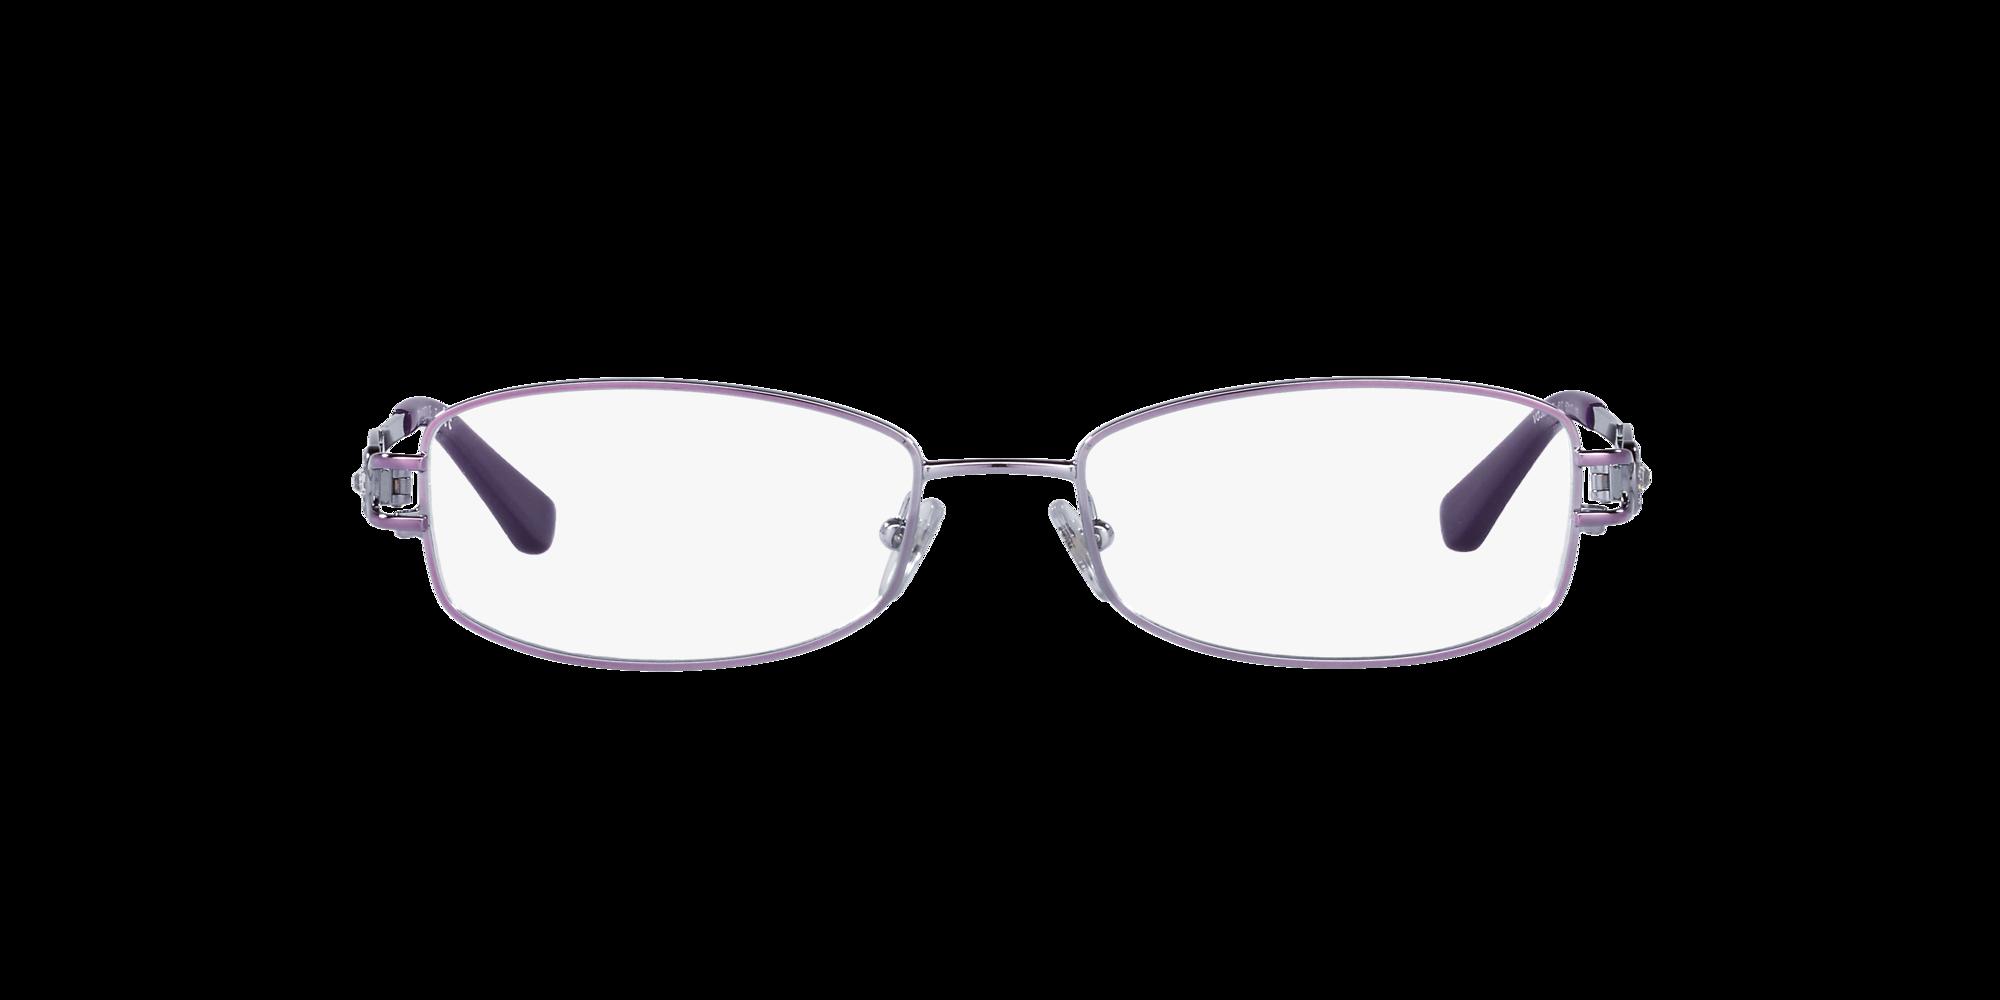 Image for VO3930BI from LensCrafters | Glasses, Prescription Glasses Online, Eyewear